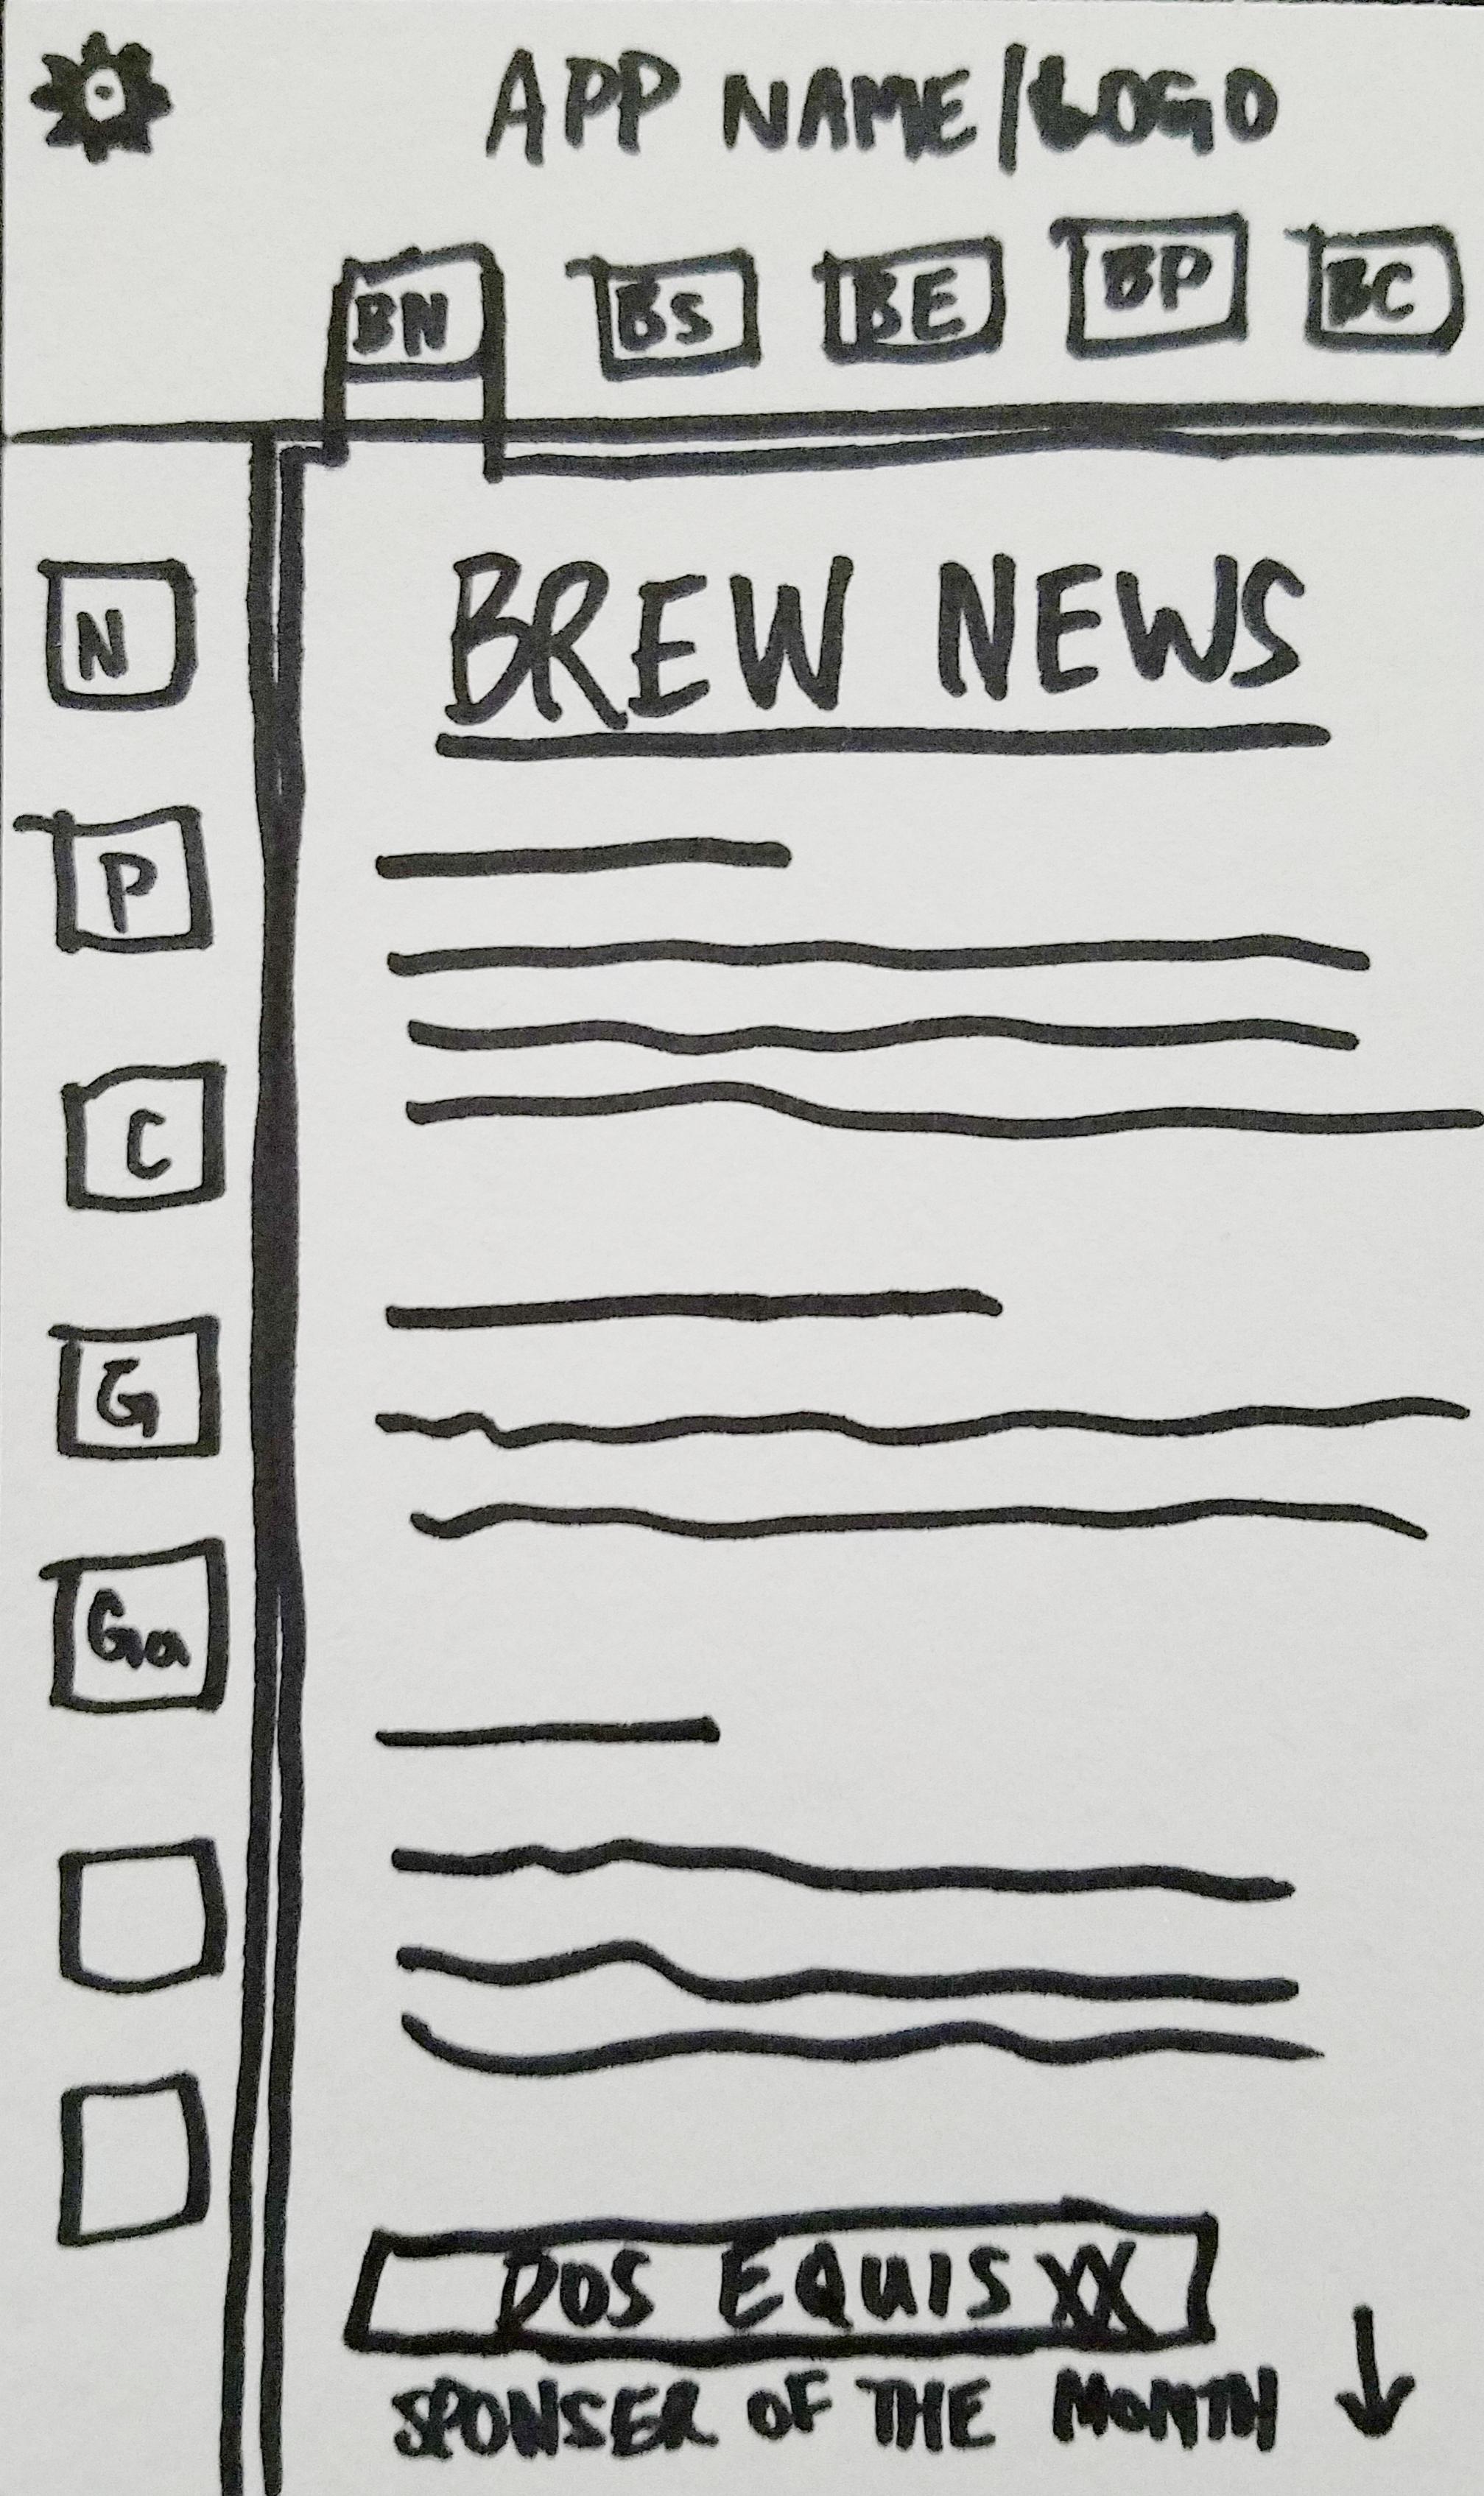 Brew News Sketch